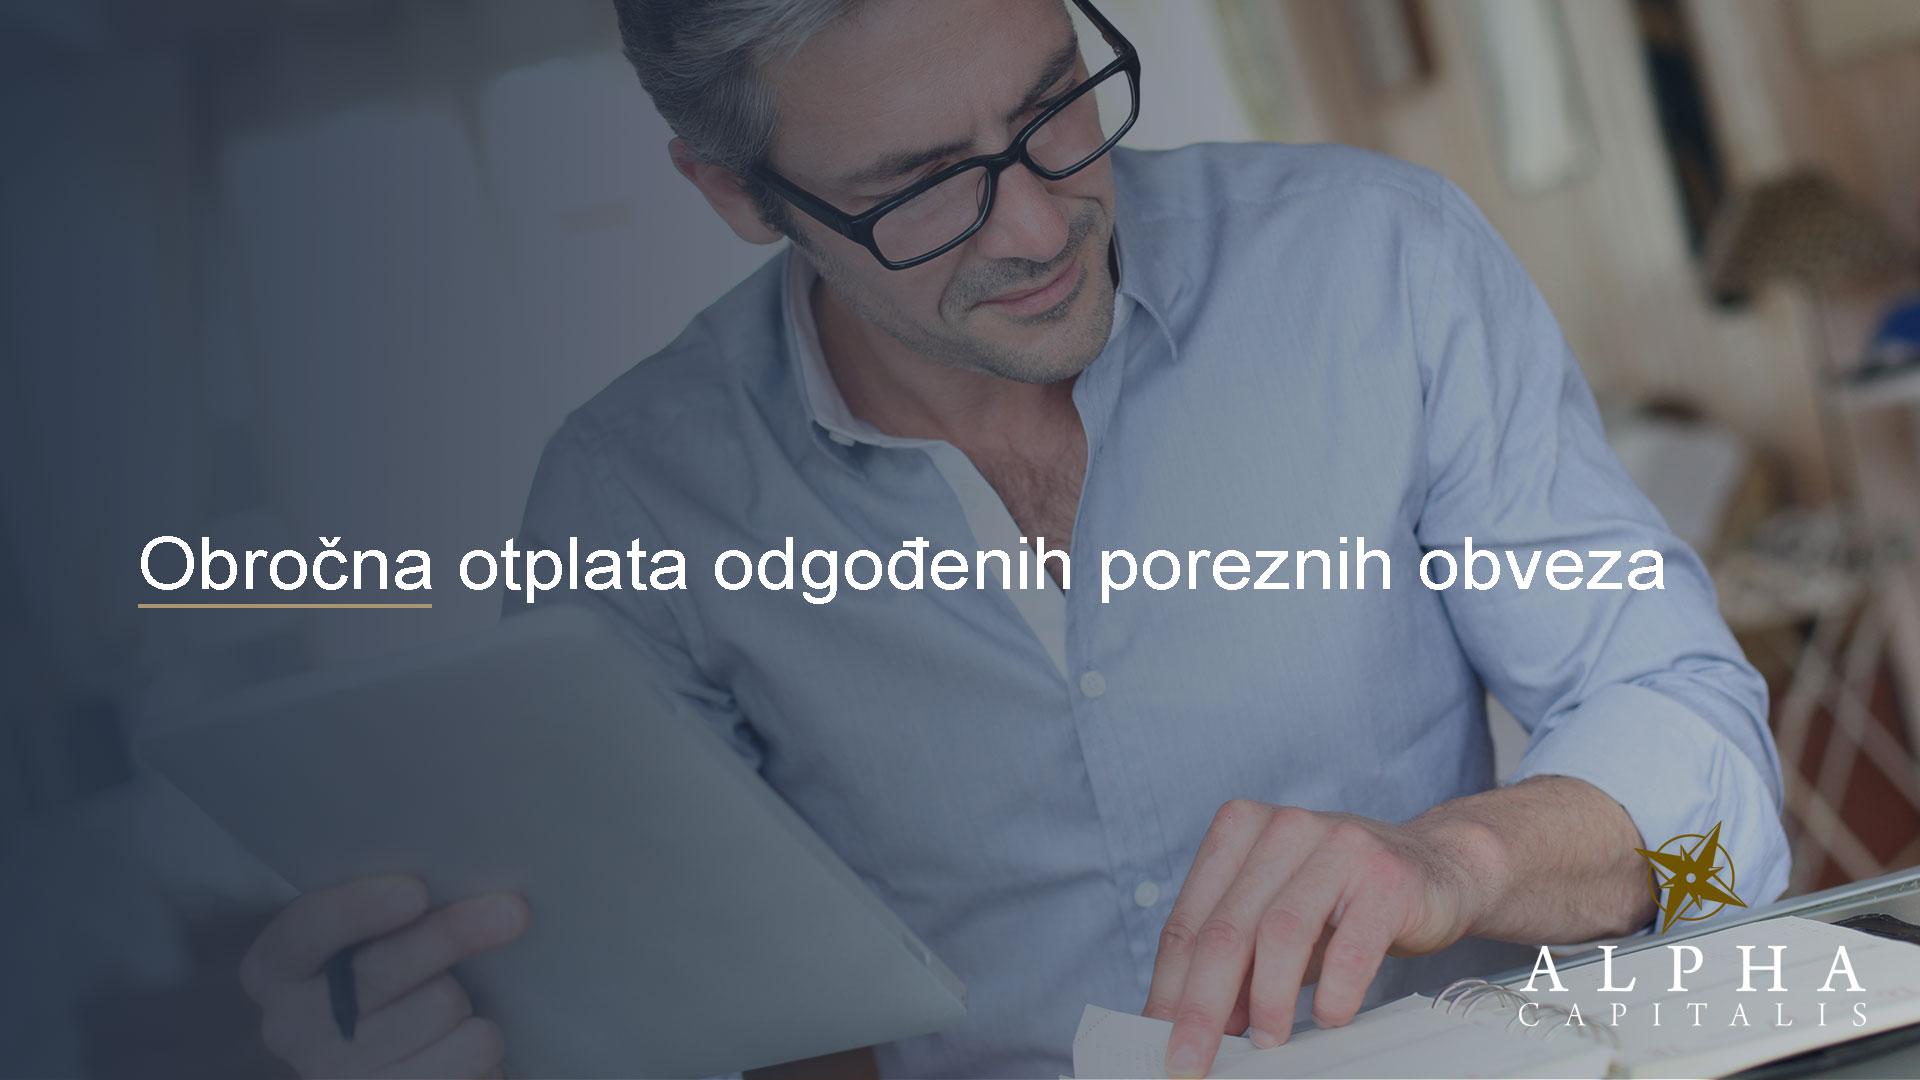 Alpha capitalis-novosti-porezne obveze